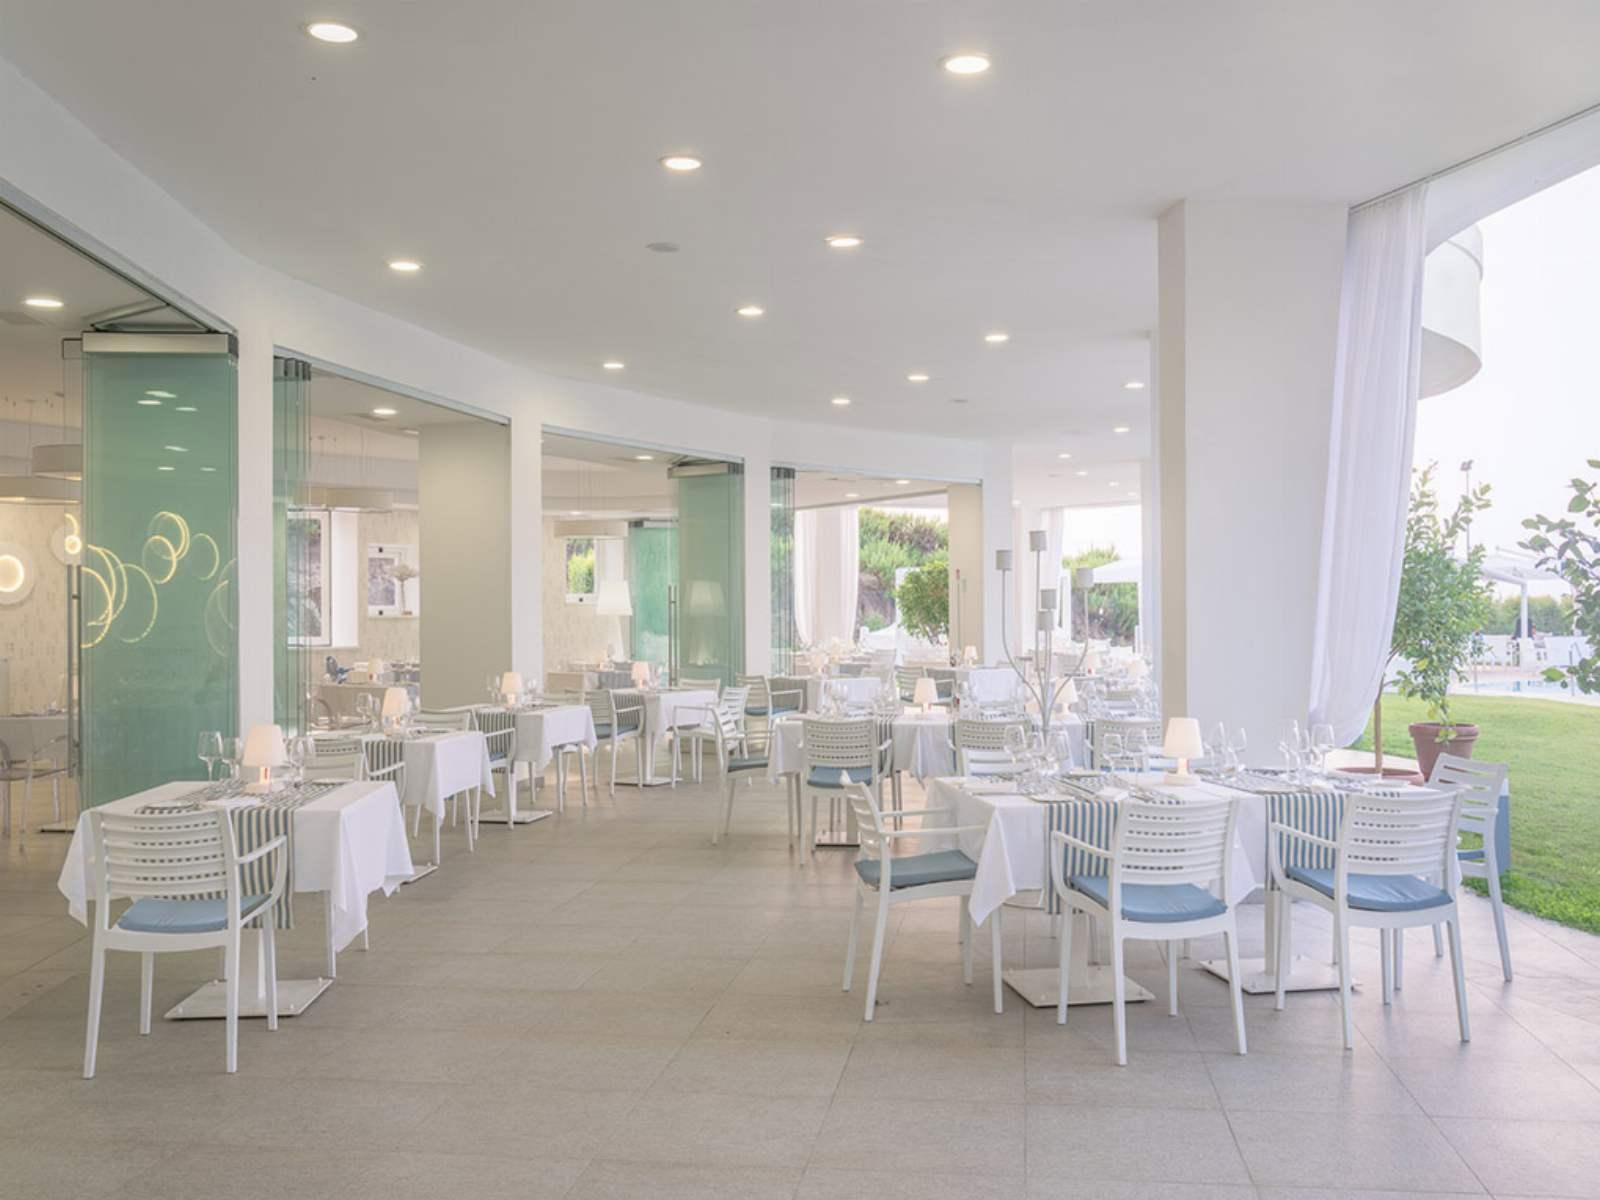 Infinity Resort & Spa: room / property / locale photo. Image 9